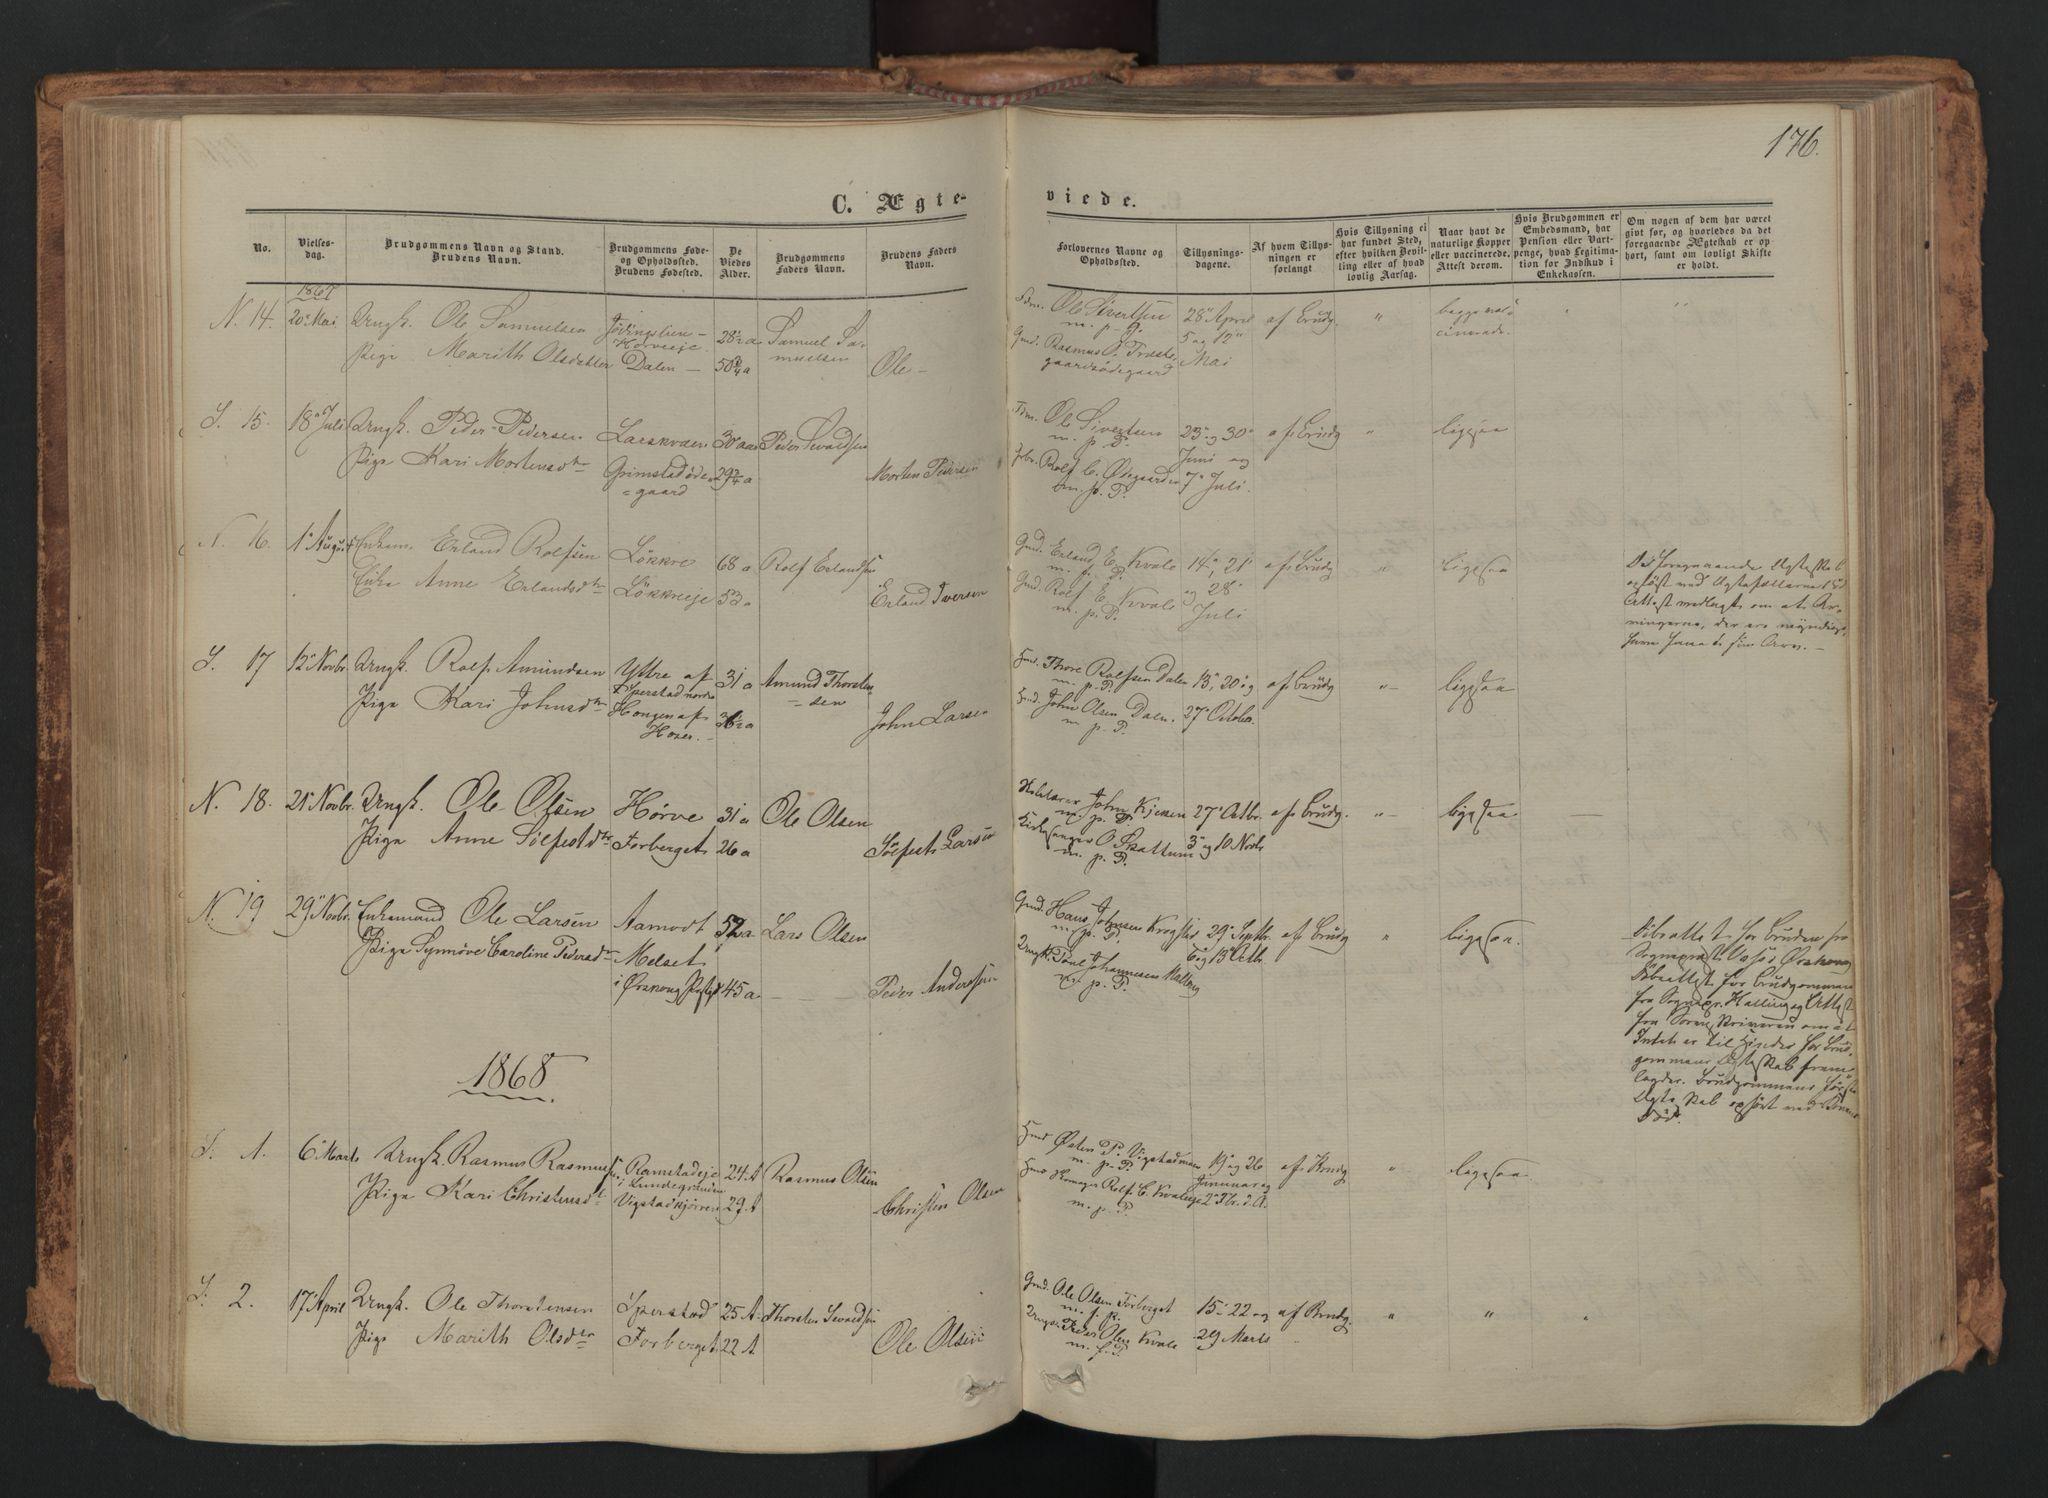 SAH, Skjåk prestekontor, Ministerialbok nr. 1, 1863-1879, s. 176